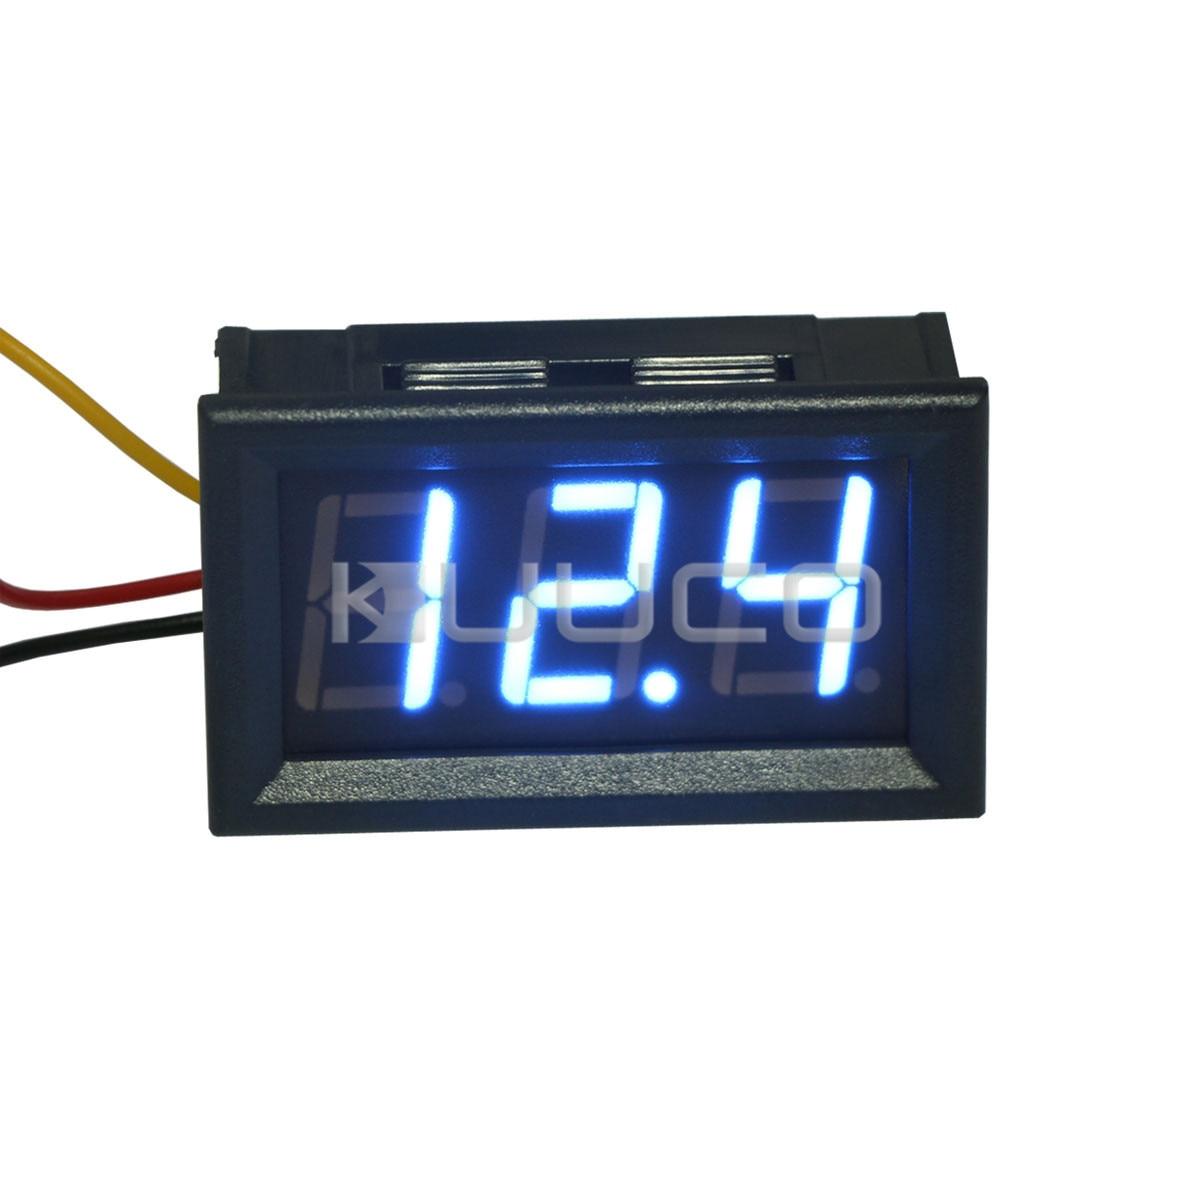 Gauge Wiring Diagram Further Dc Meter Wiring Diagram On Car Voltage